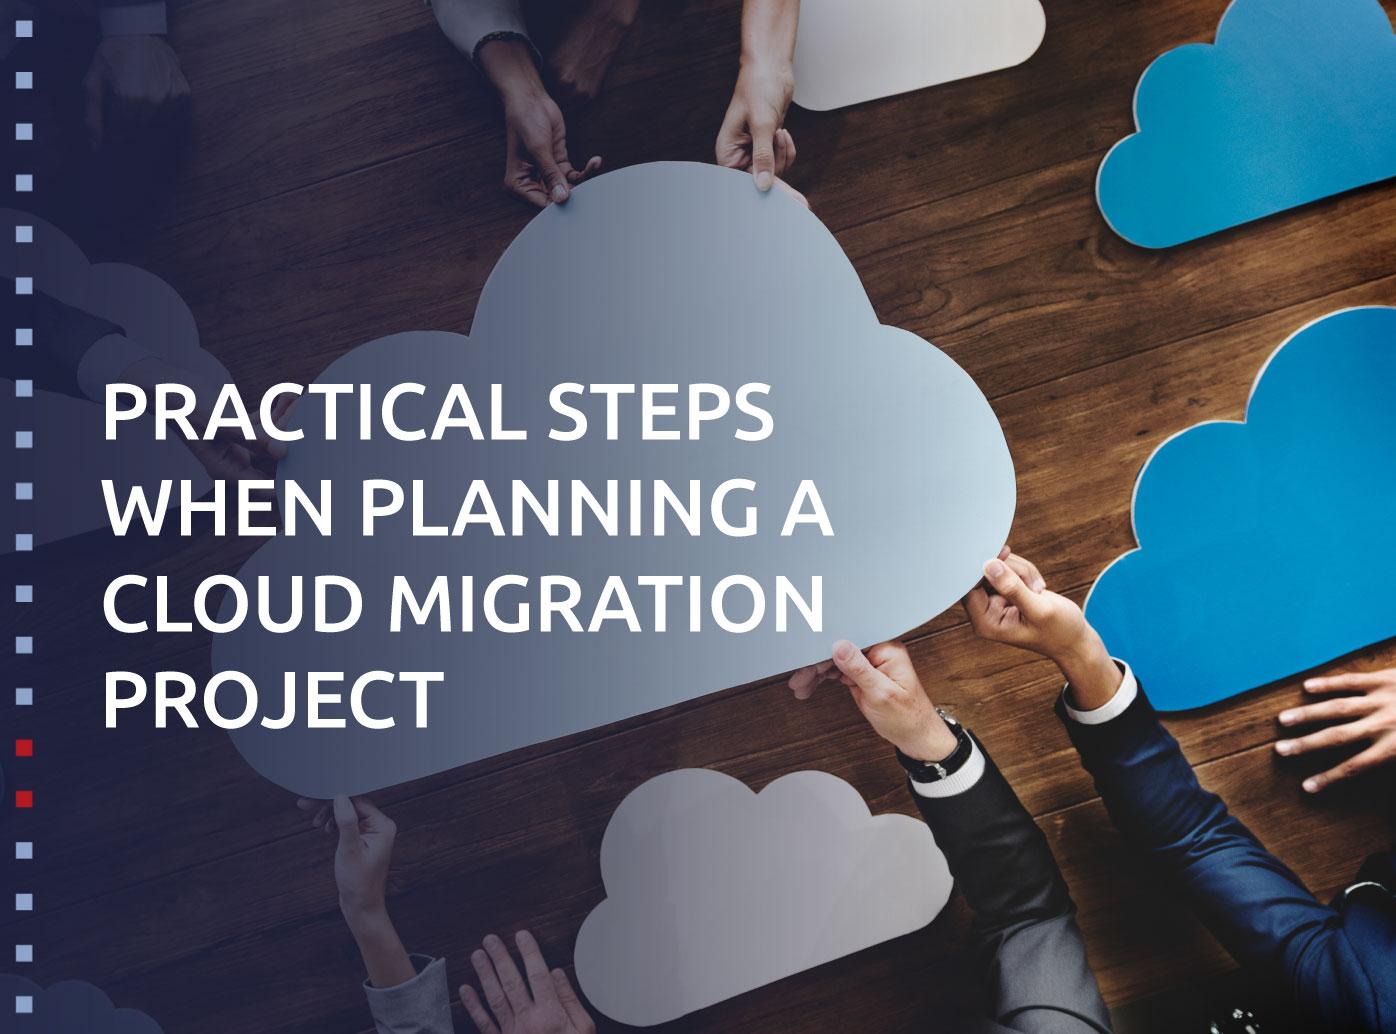 Practical steps when planning a cloud migration project